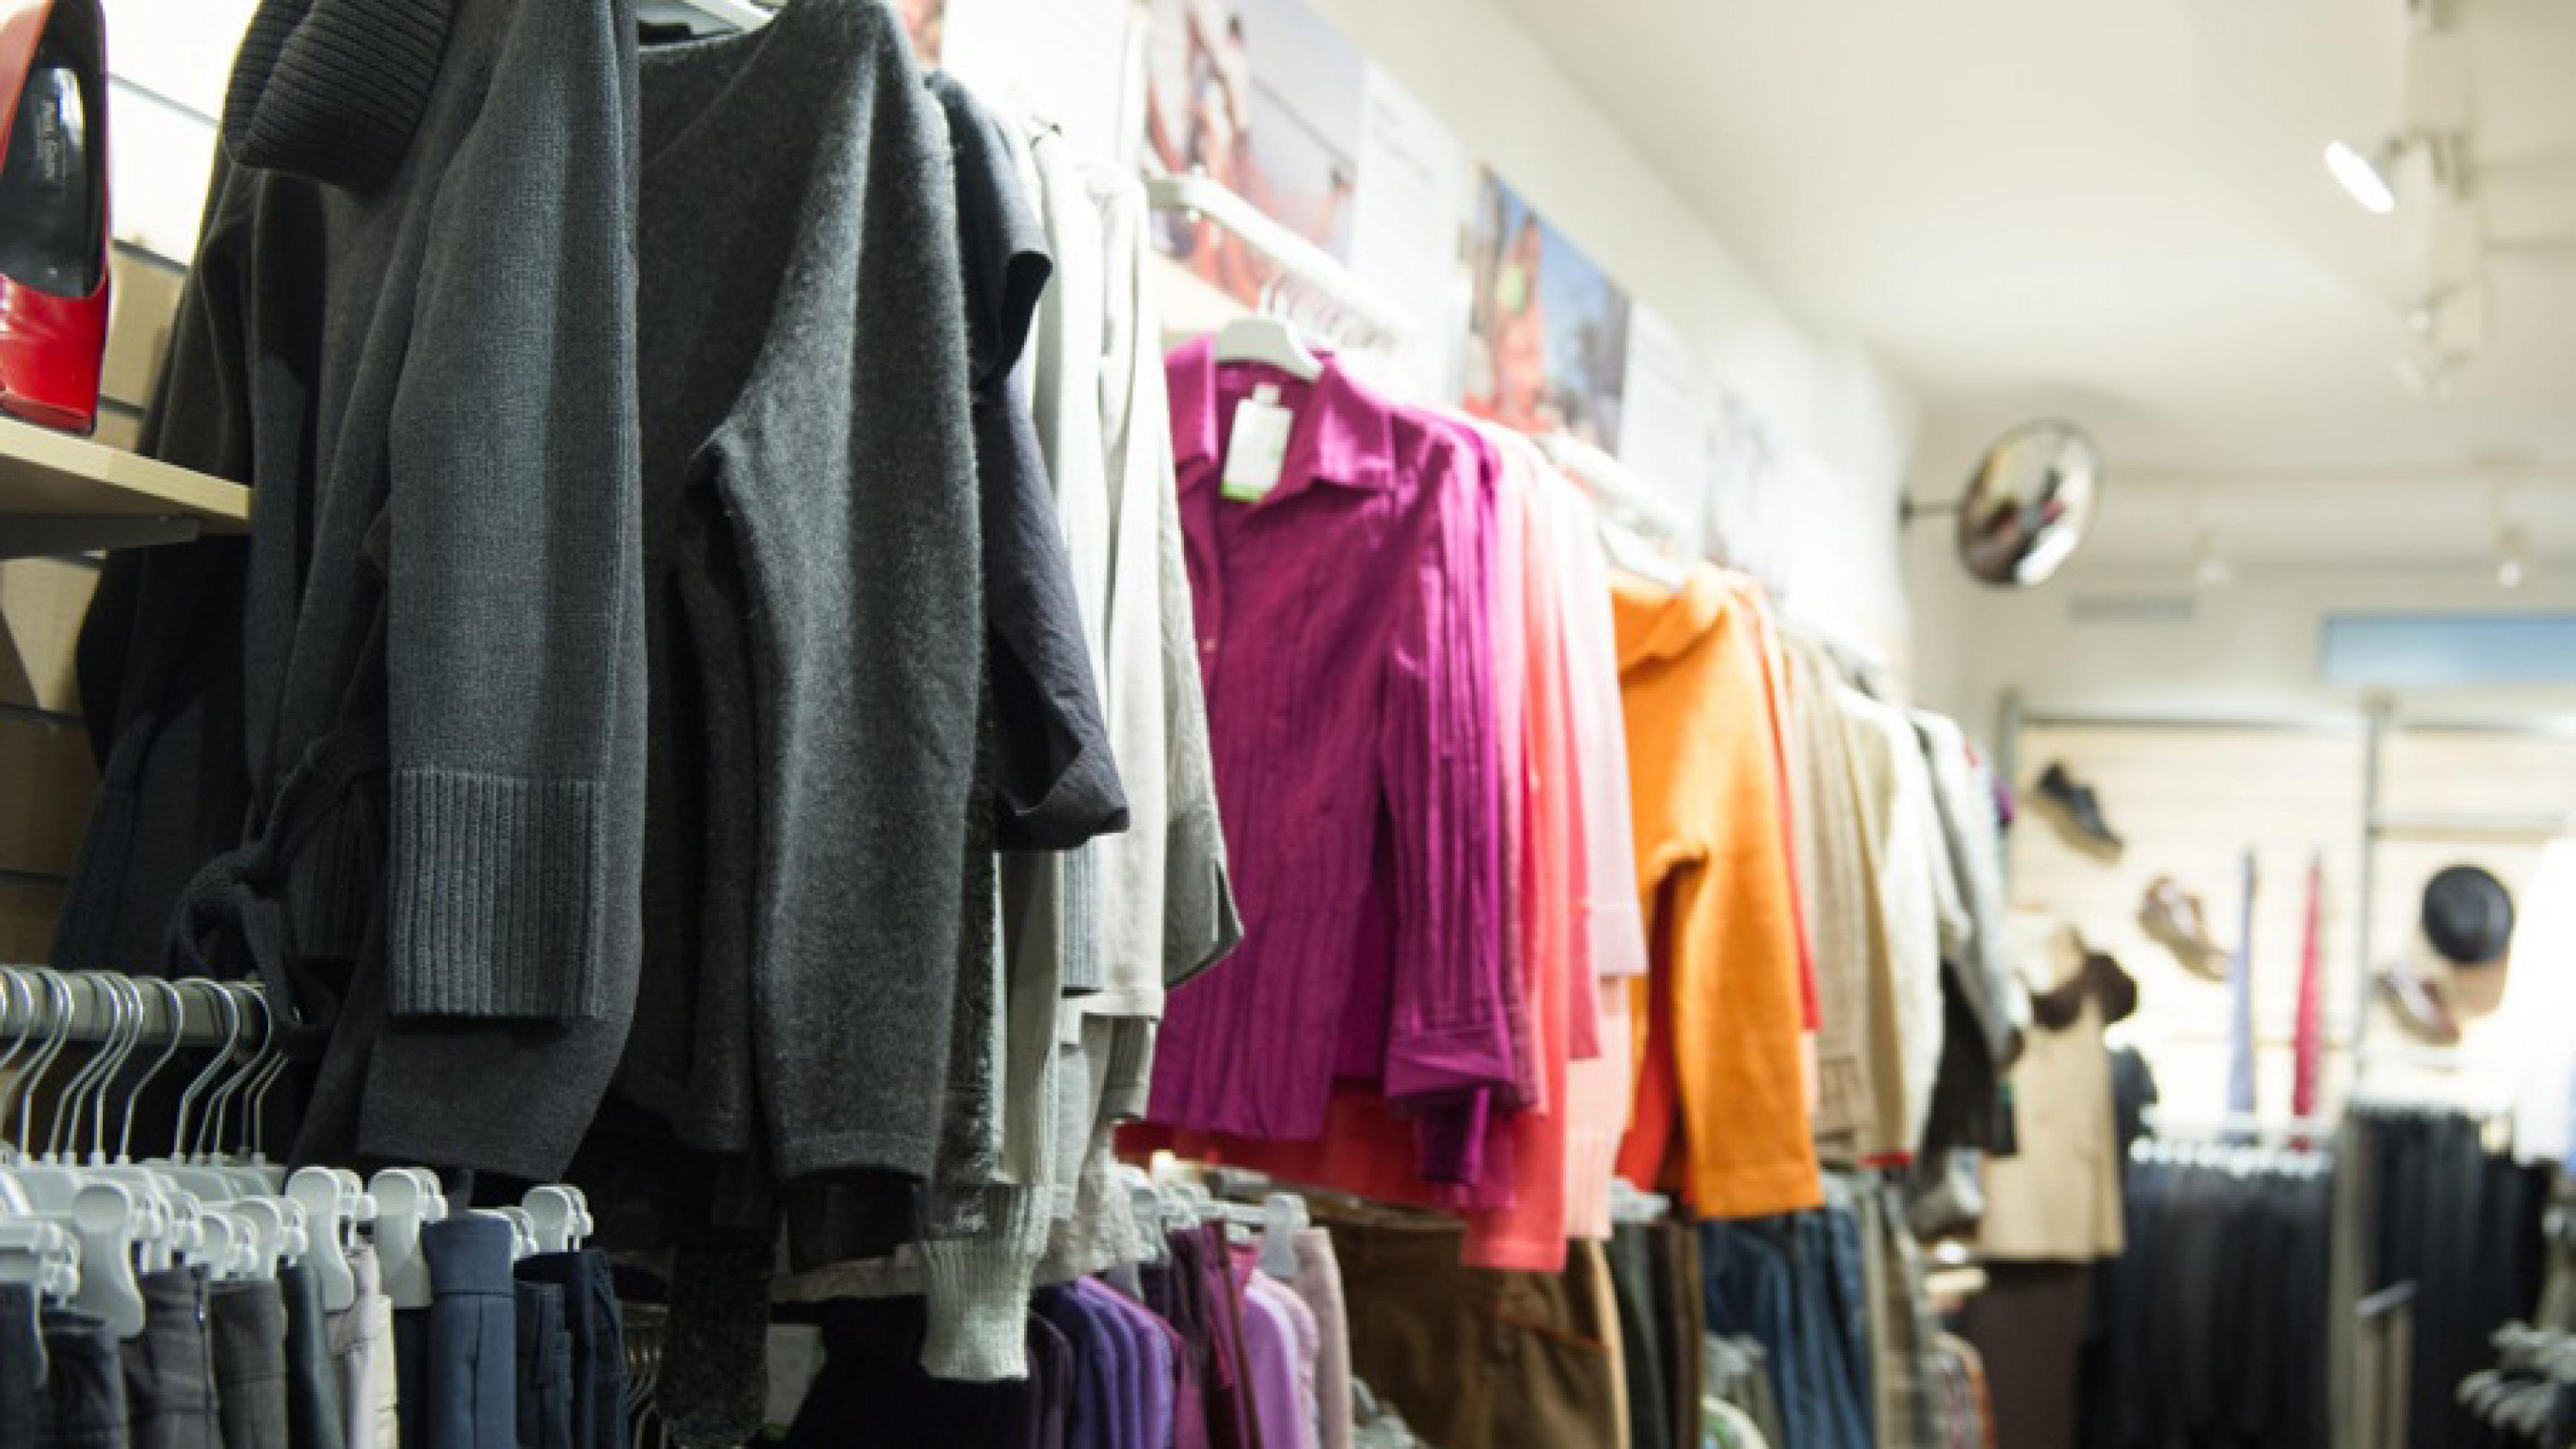 Oxfam Fashionshop Ulm - Innenansicht